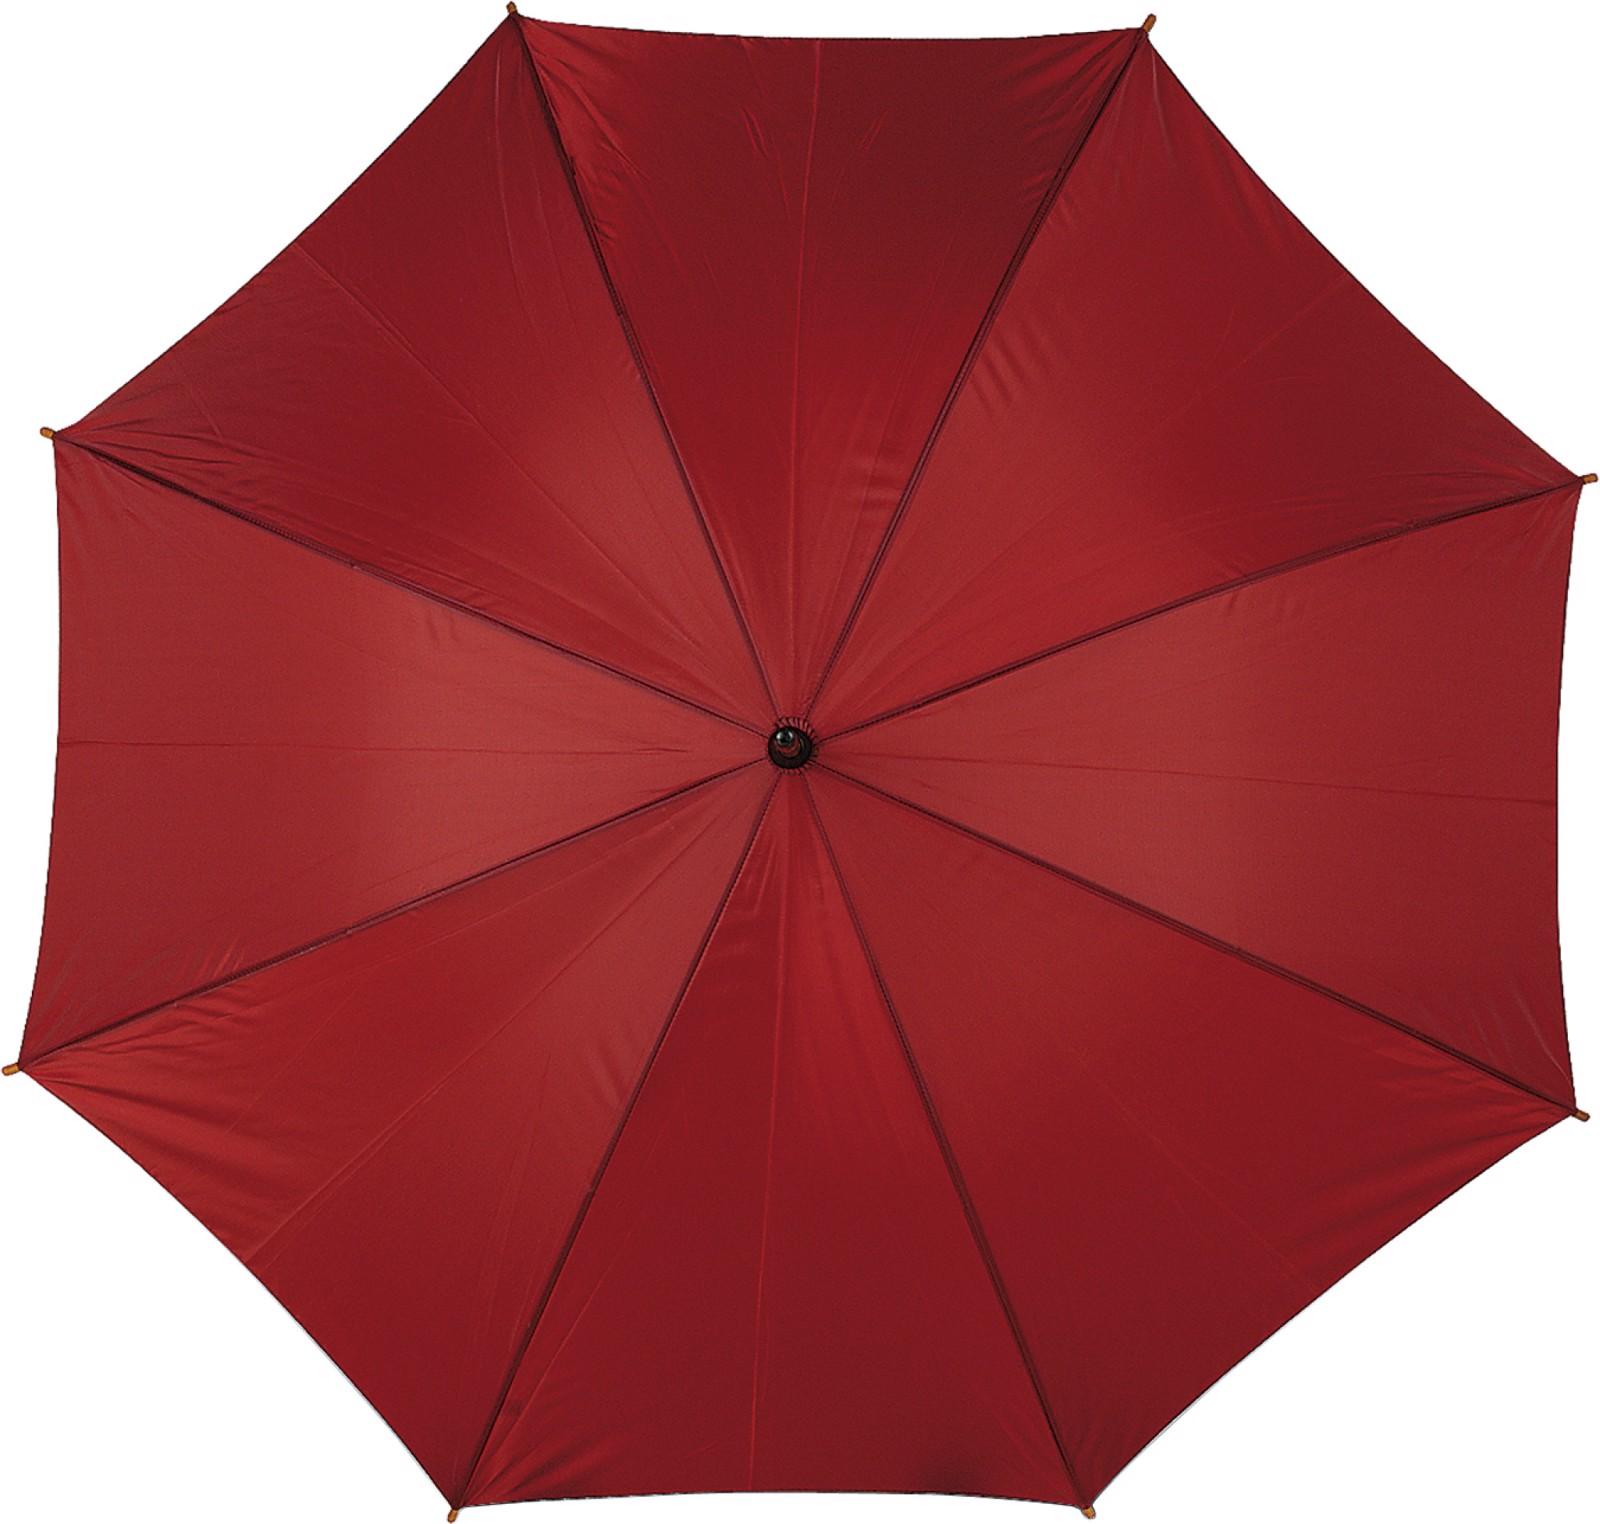 Polyester (190T) umbrella - Burgundy